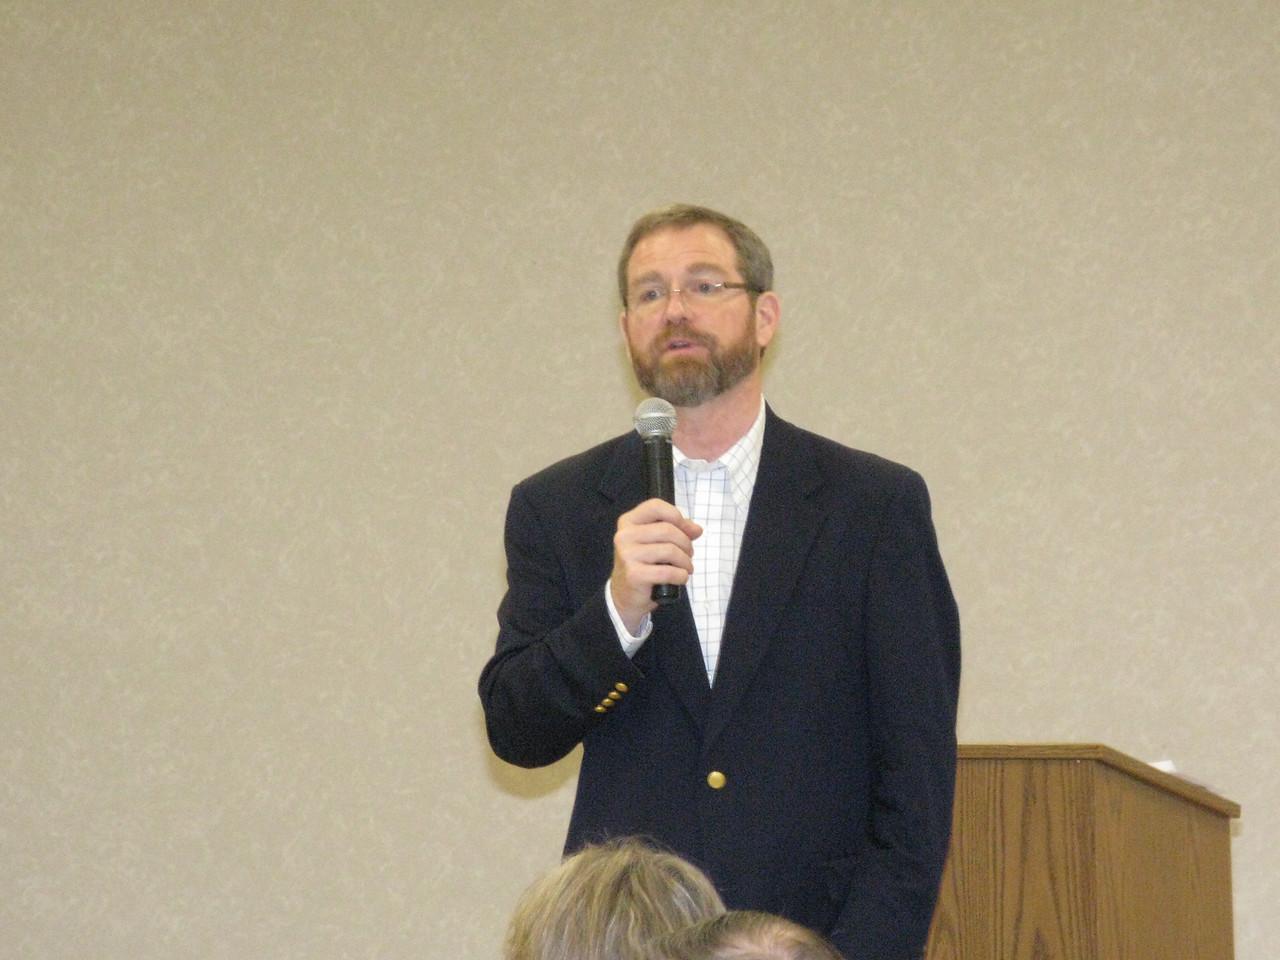 Woodlands, Texas, St  Anthony, Cavins - 170 - 2010-02-20